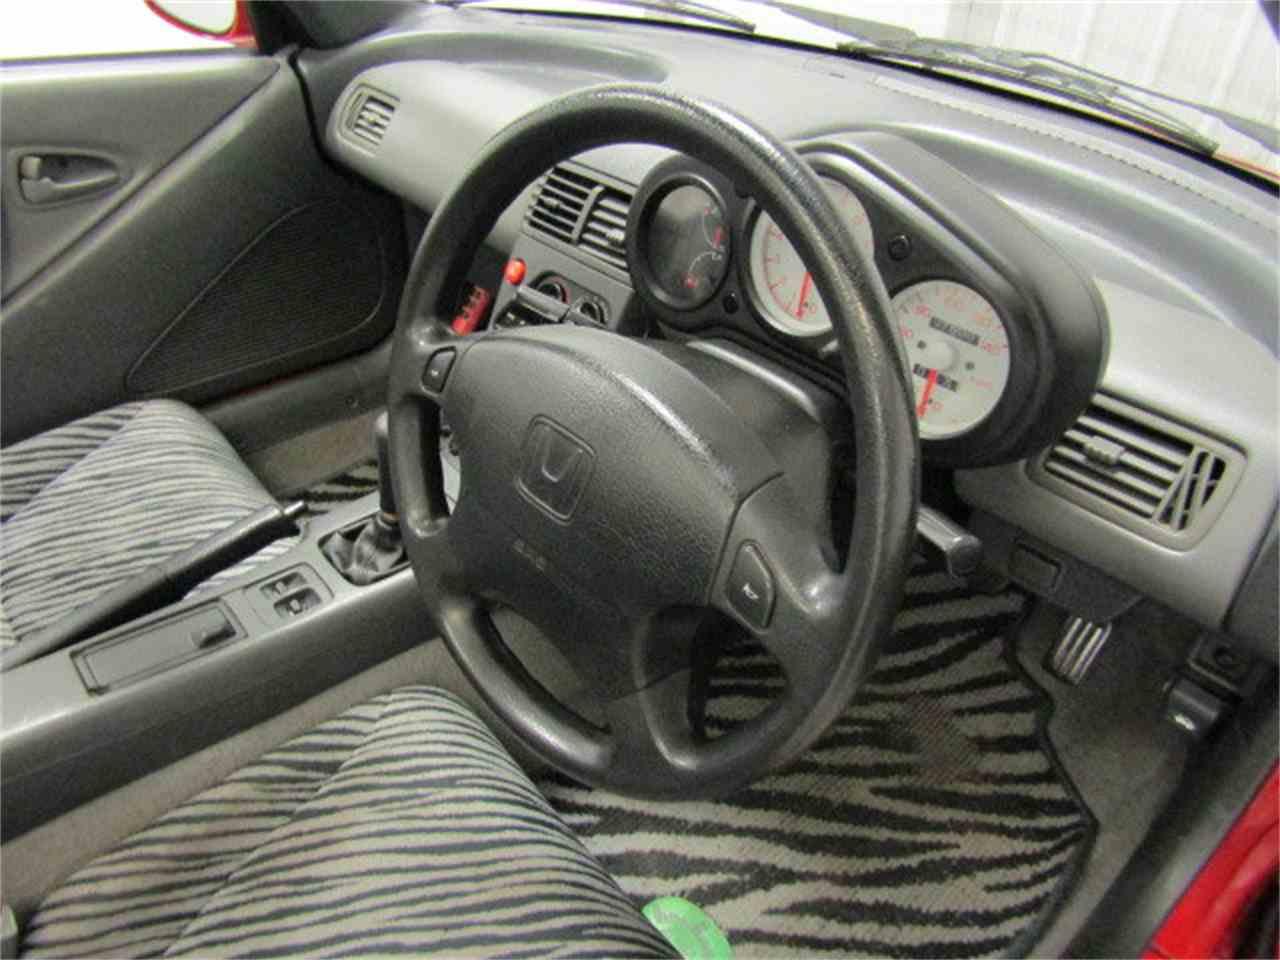 Large Picture of '91 Honda Beat - $6,999.00 - JL83